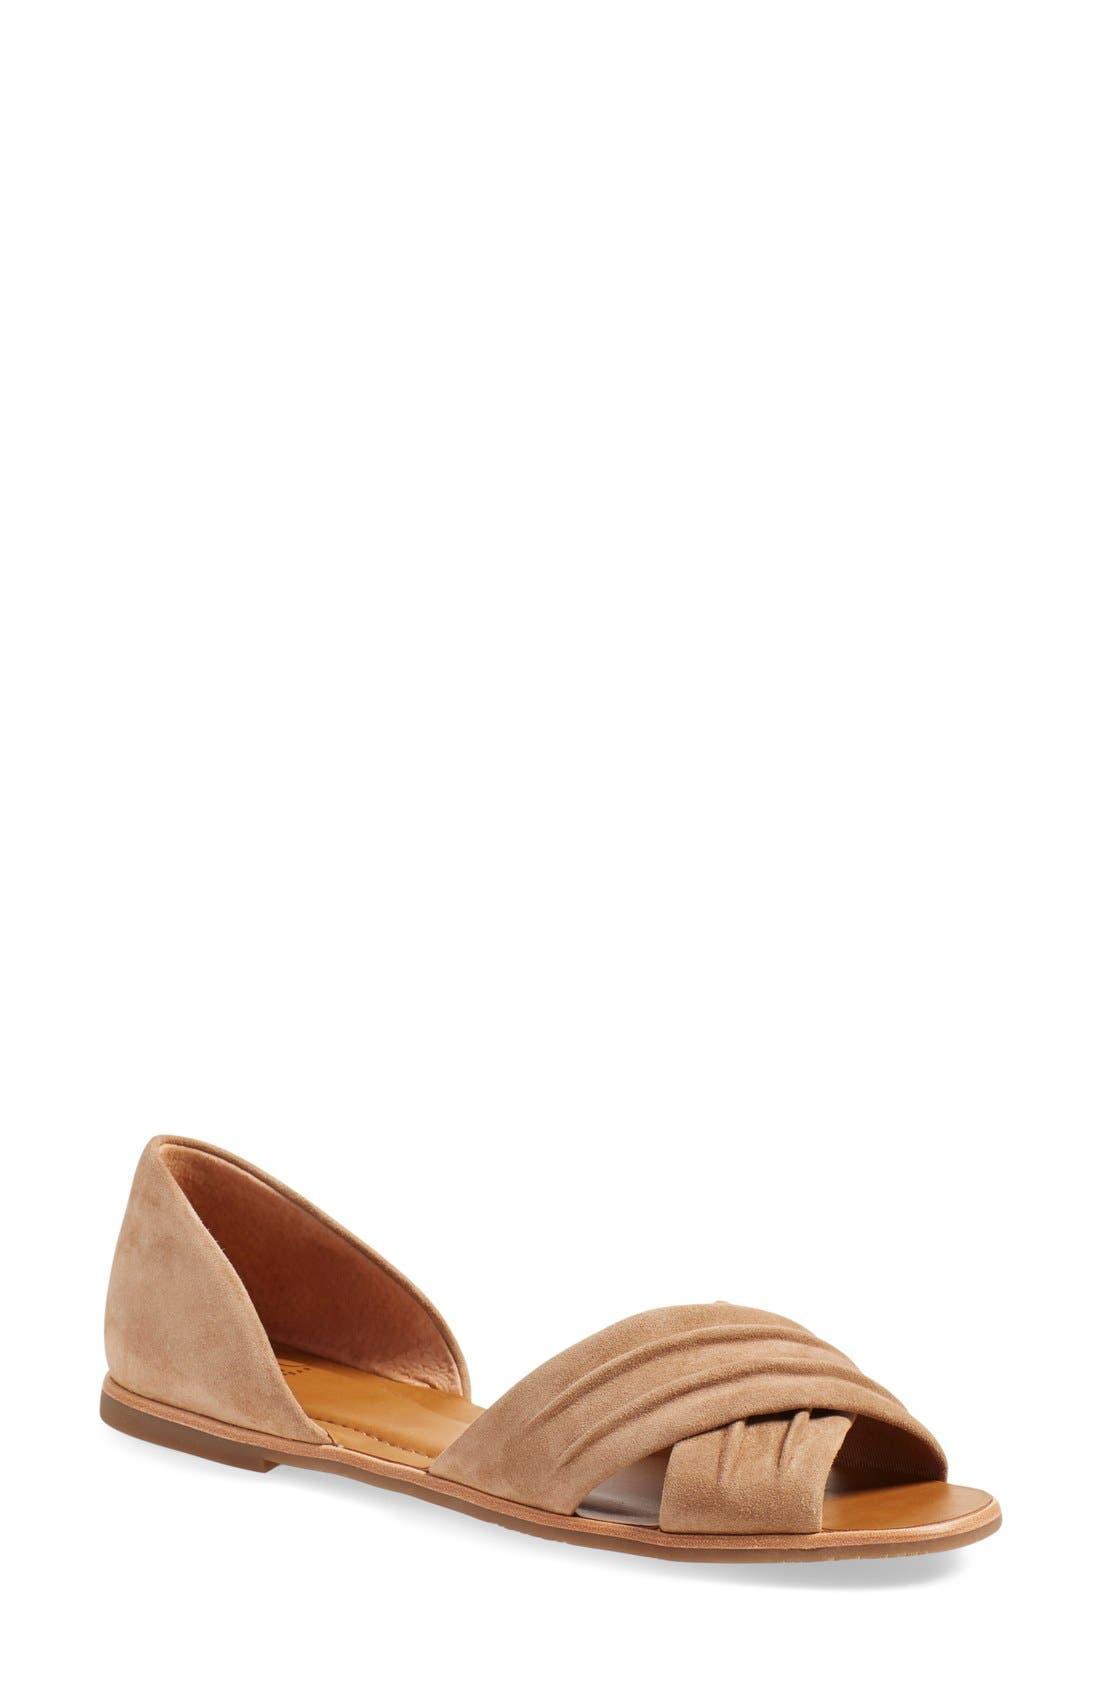 Main Image - SARTO by Franco Sarto 'Vala' Flat Sandal (Women)